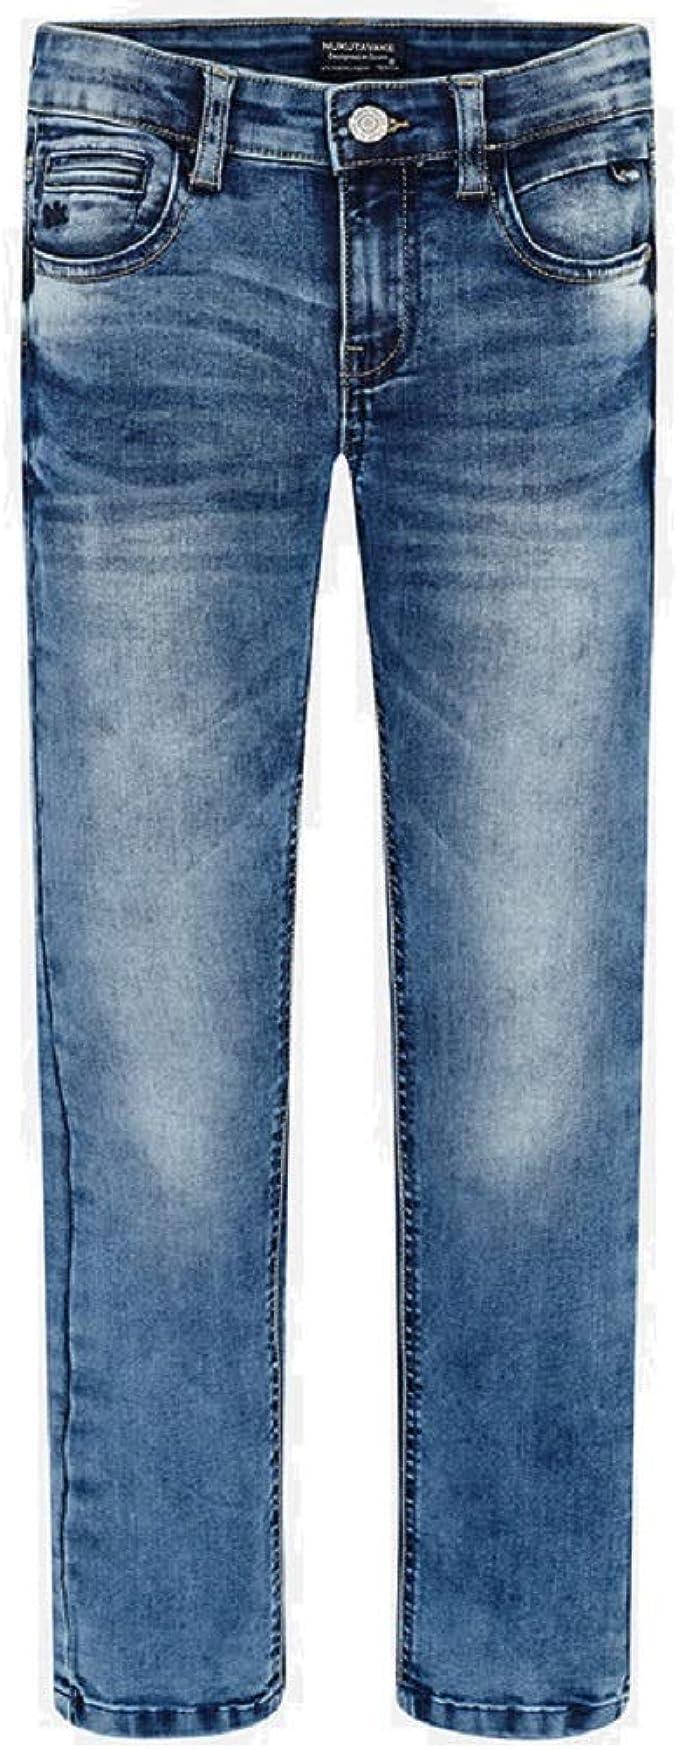 Mayoral Pantalon Tejano Super Slim Nino Modelo 6513 Pantalones